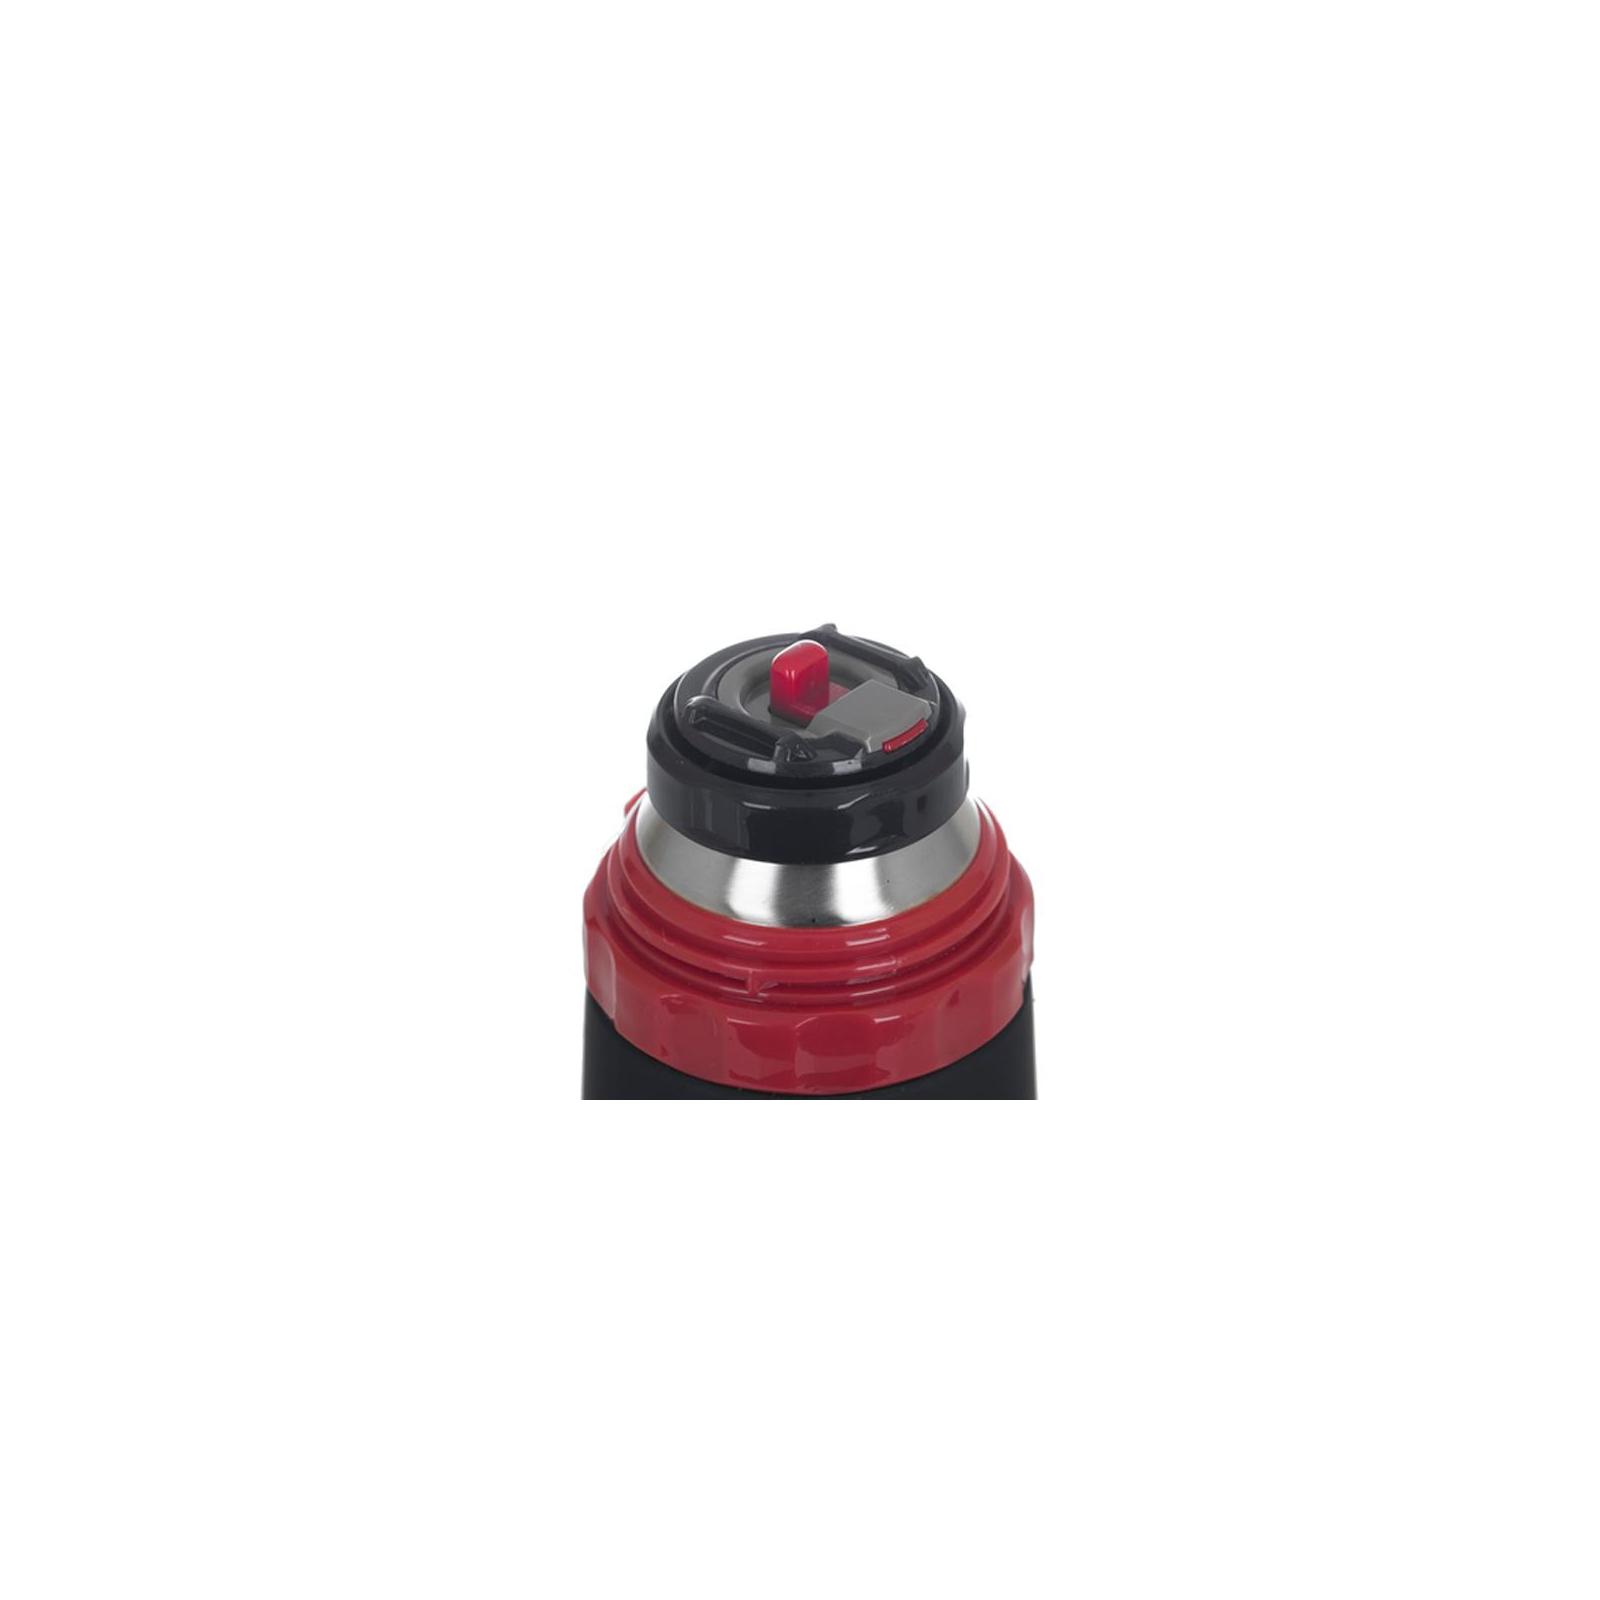 Термос Ringel Solo 0.4 L Black (RG-6101-400/2) изображение 3